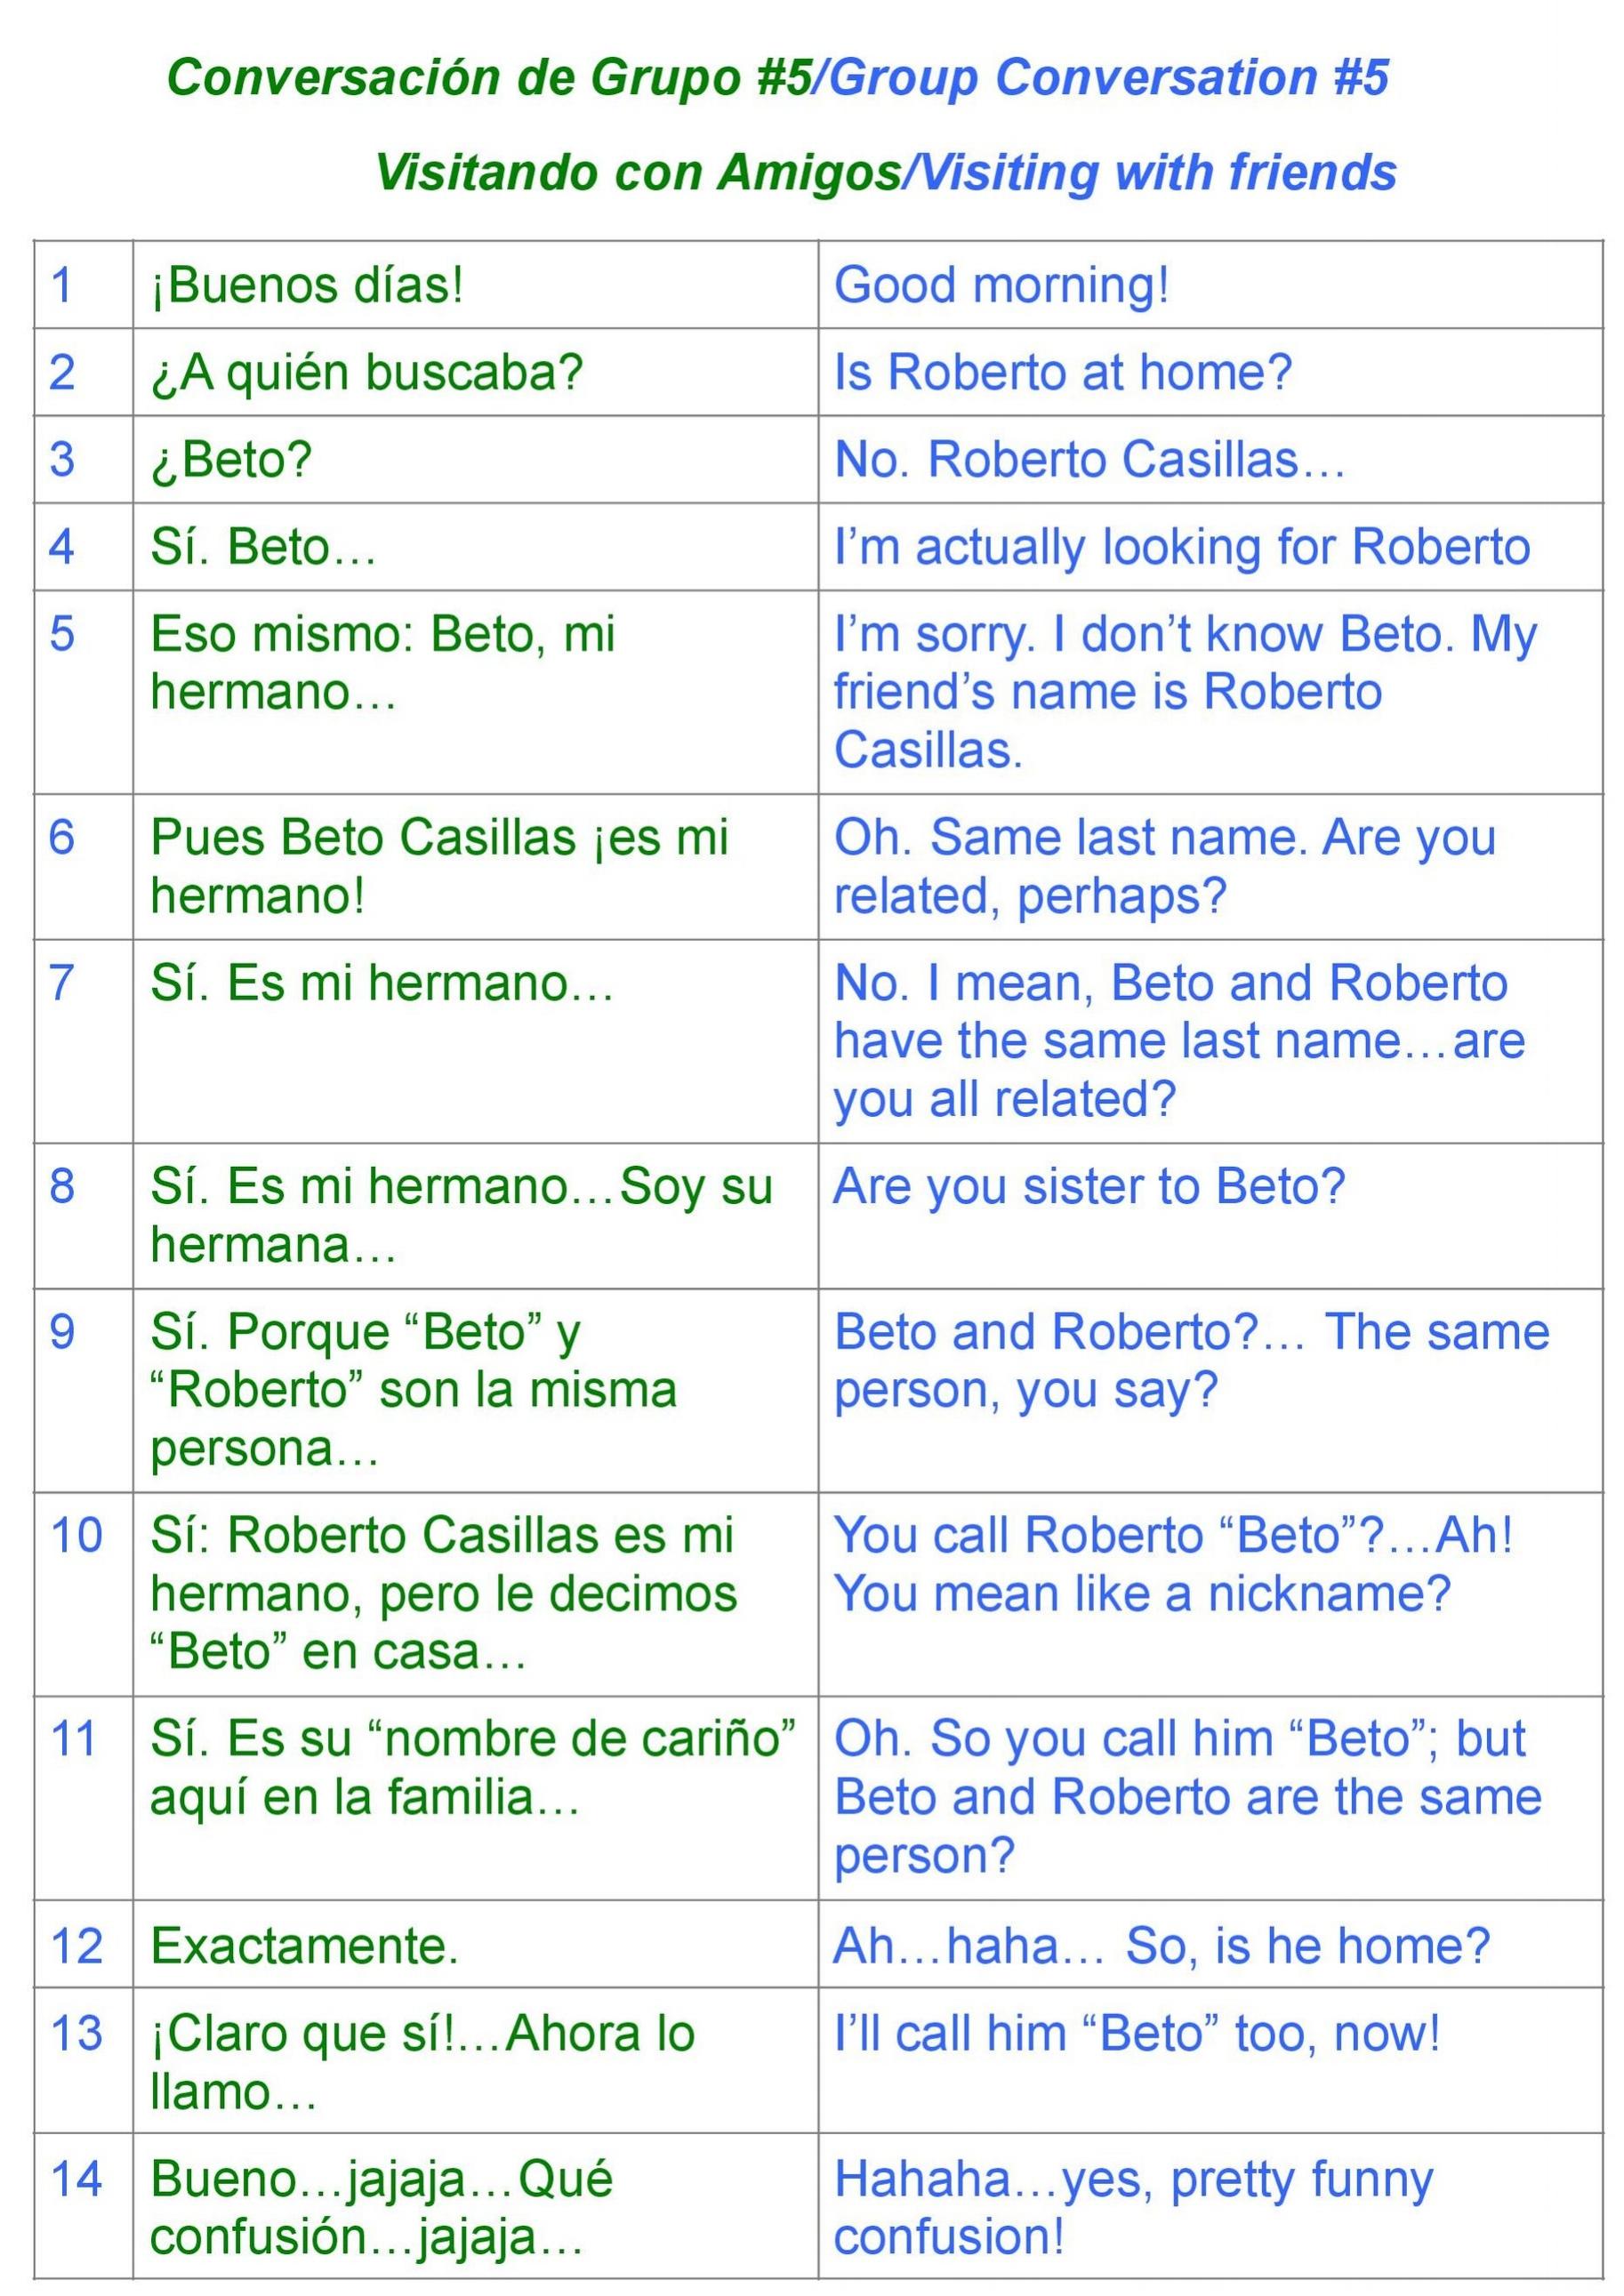 PB! Chapter 2.5 Conversation .jpg